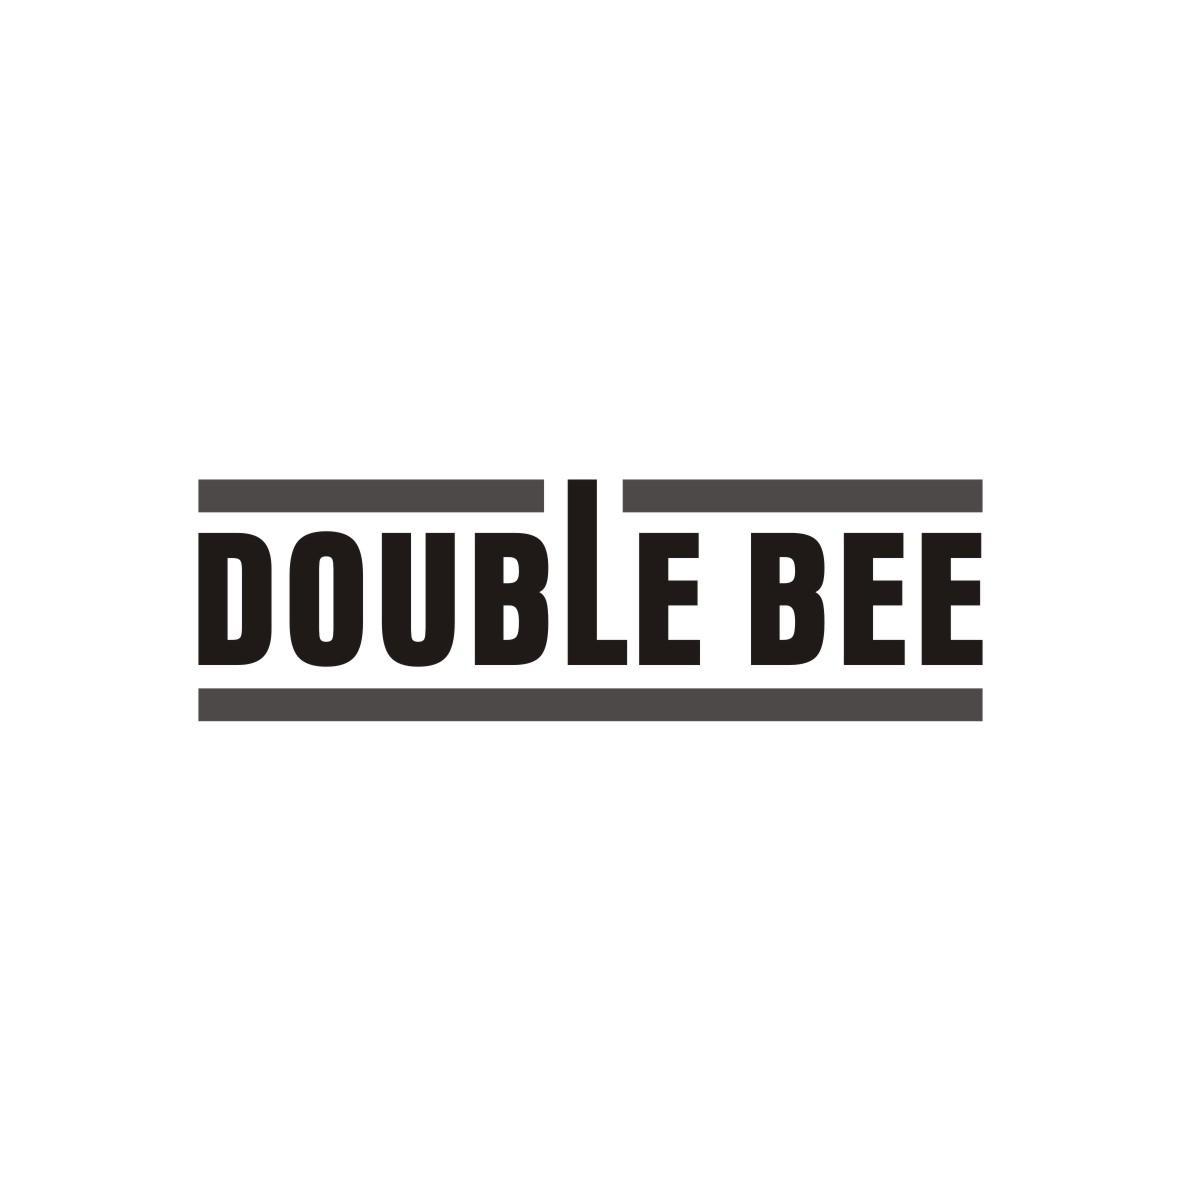 转让商标-DOUBLE BEE